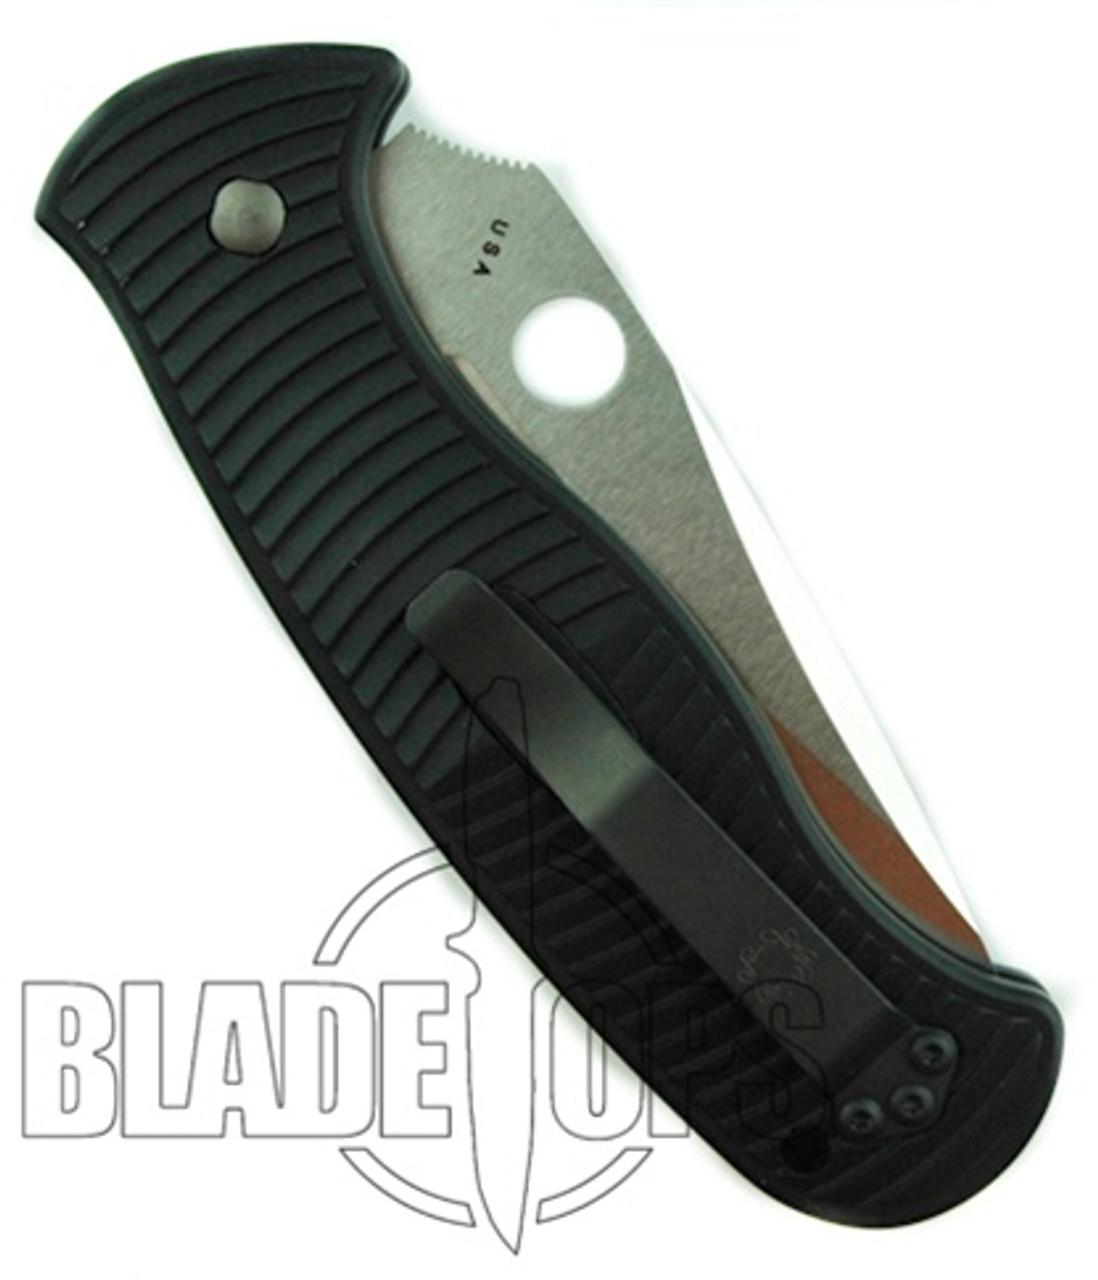 Spyderco Citadel Auto, Plain Edge Blade